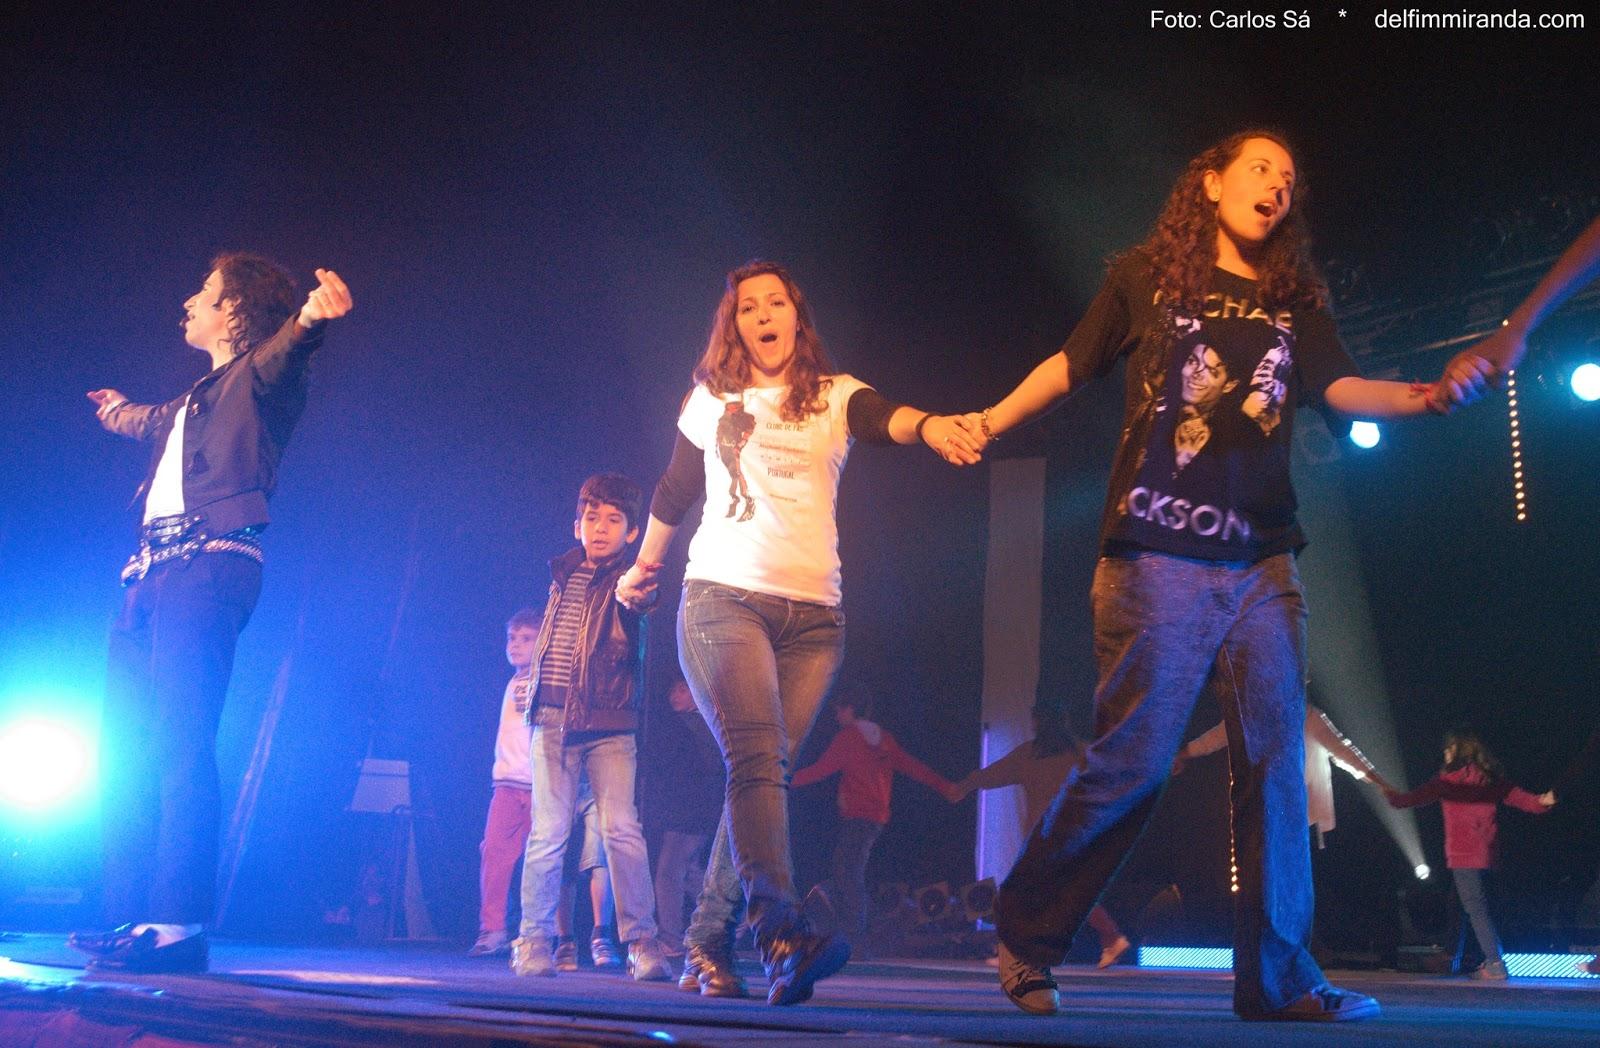 Delfim Miranda - Michael Jackson Tribute - MJ fans and Children invited for the performance